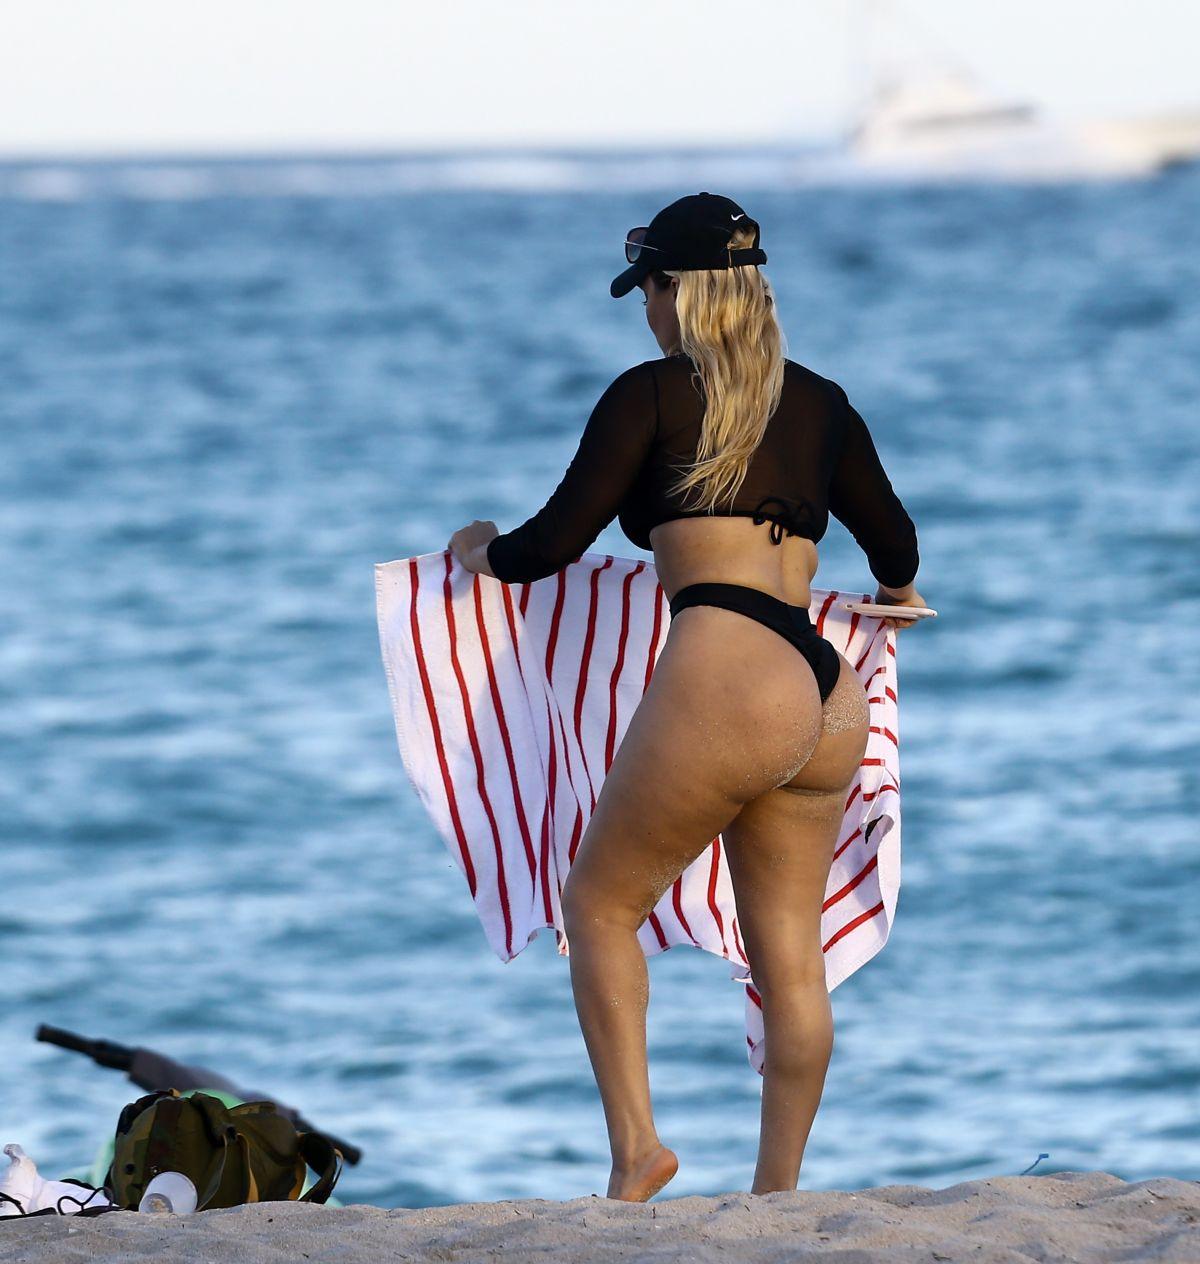 Celebrites Andrea Gaviria nudes (11 photo), Topless, Paparazzi, Feet, underwear 2018